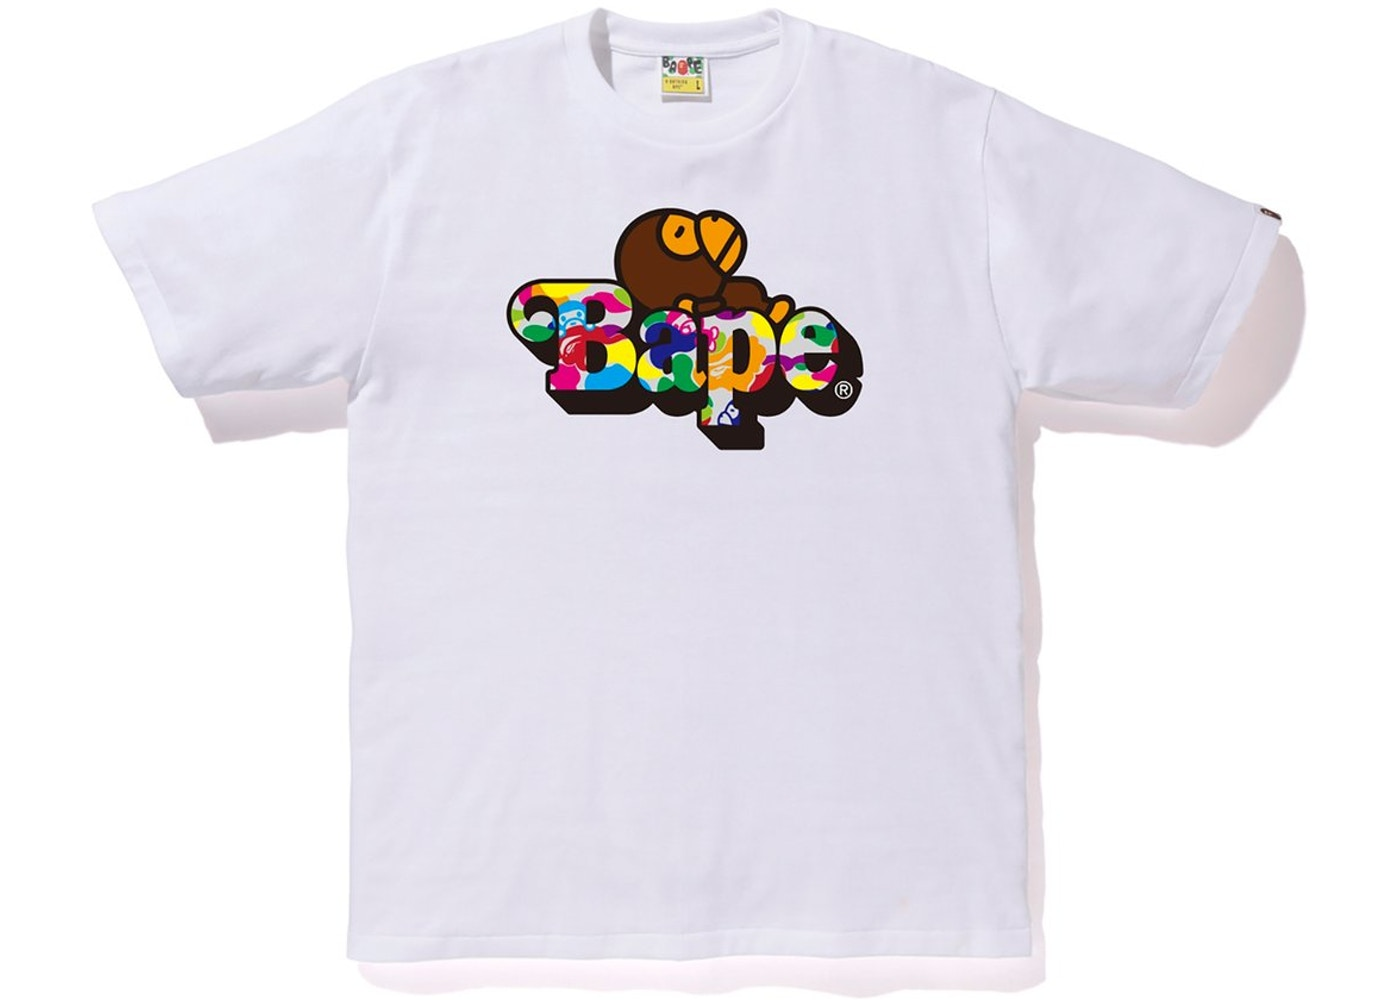 e7a68c8a Sell. or Ask. Size: XL. View All Bids. BAPE Milo ABC Multi Milo On Bape Tee  White